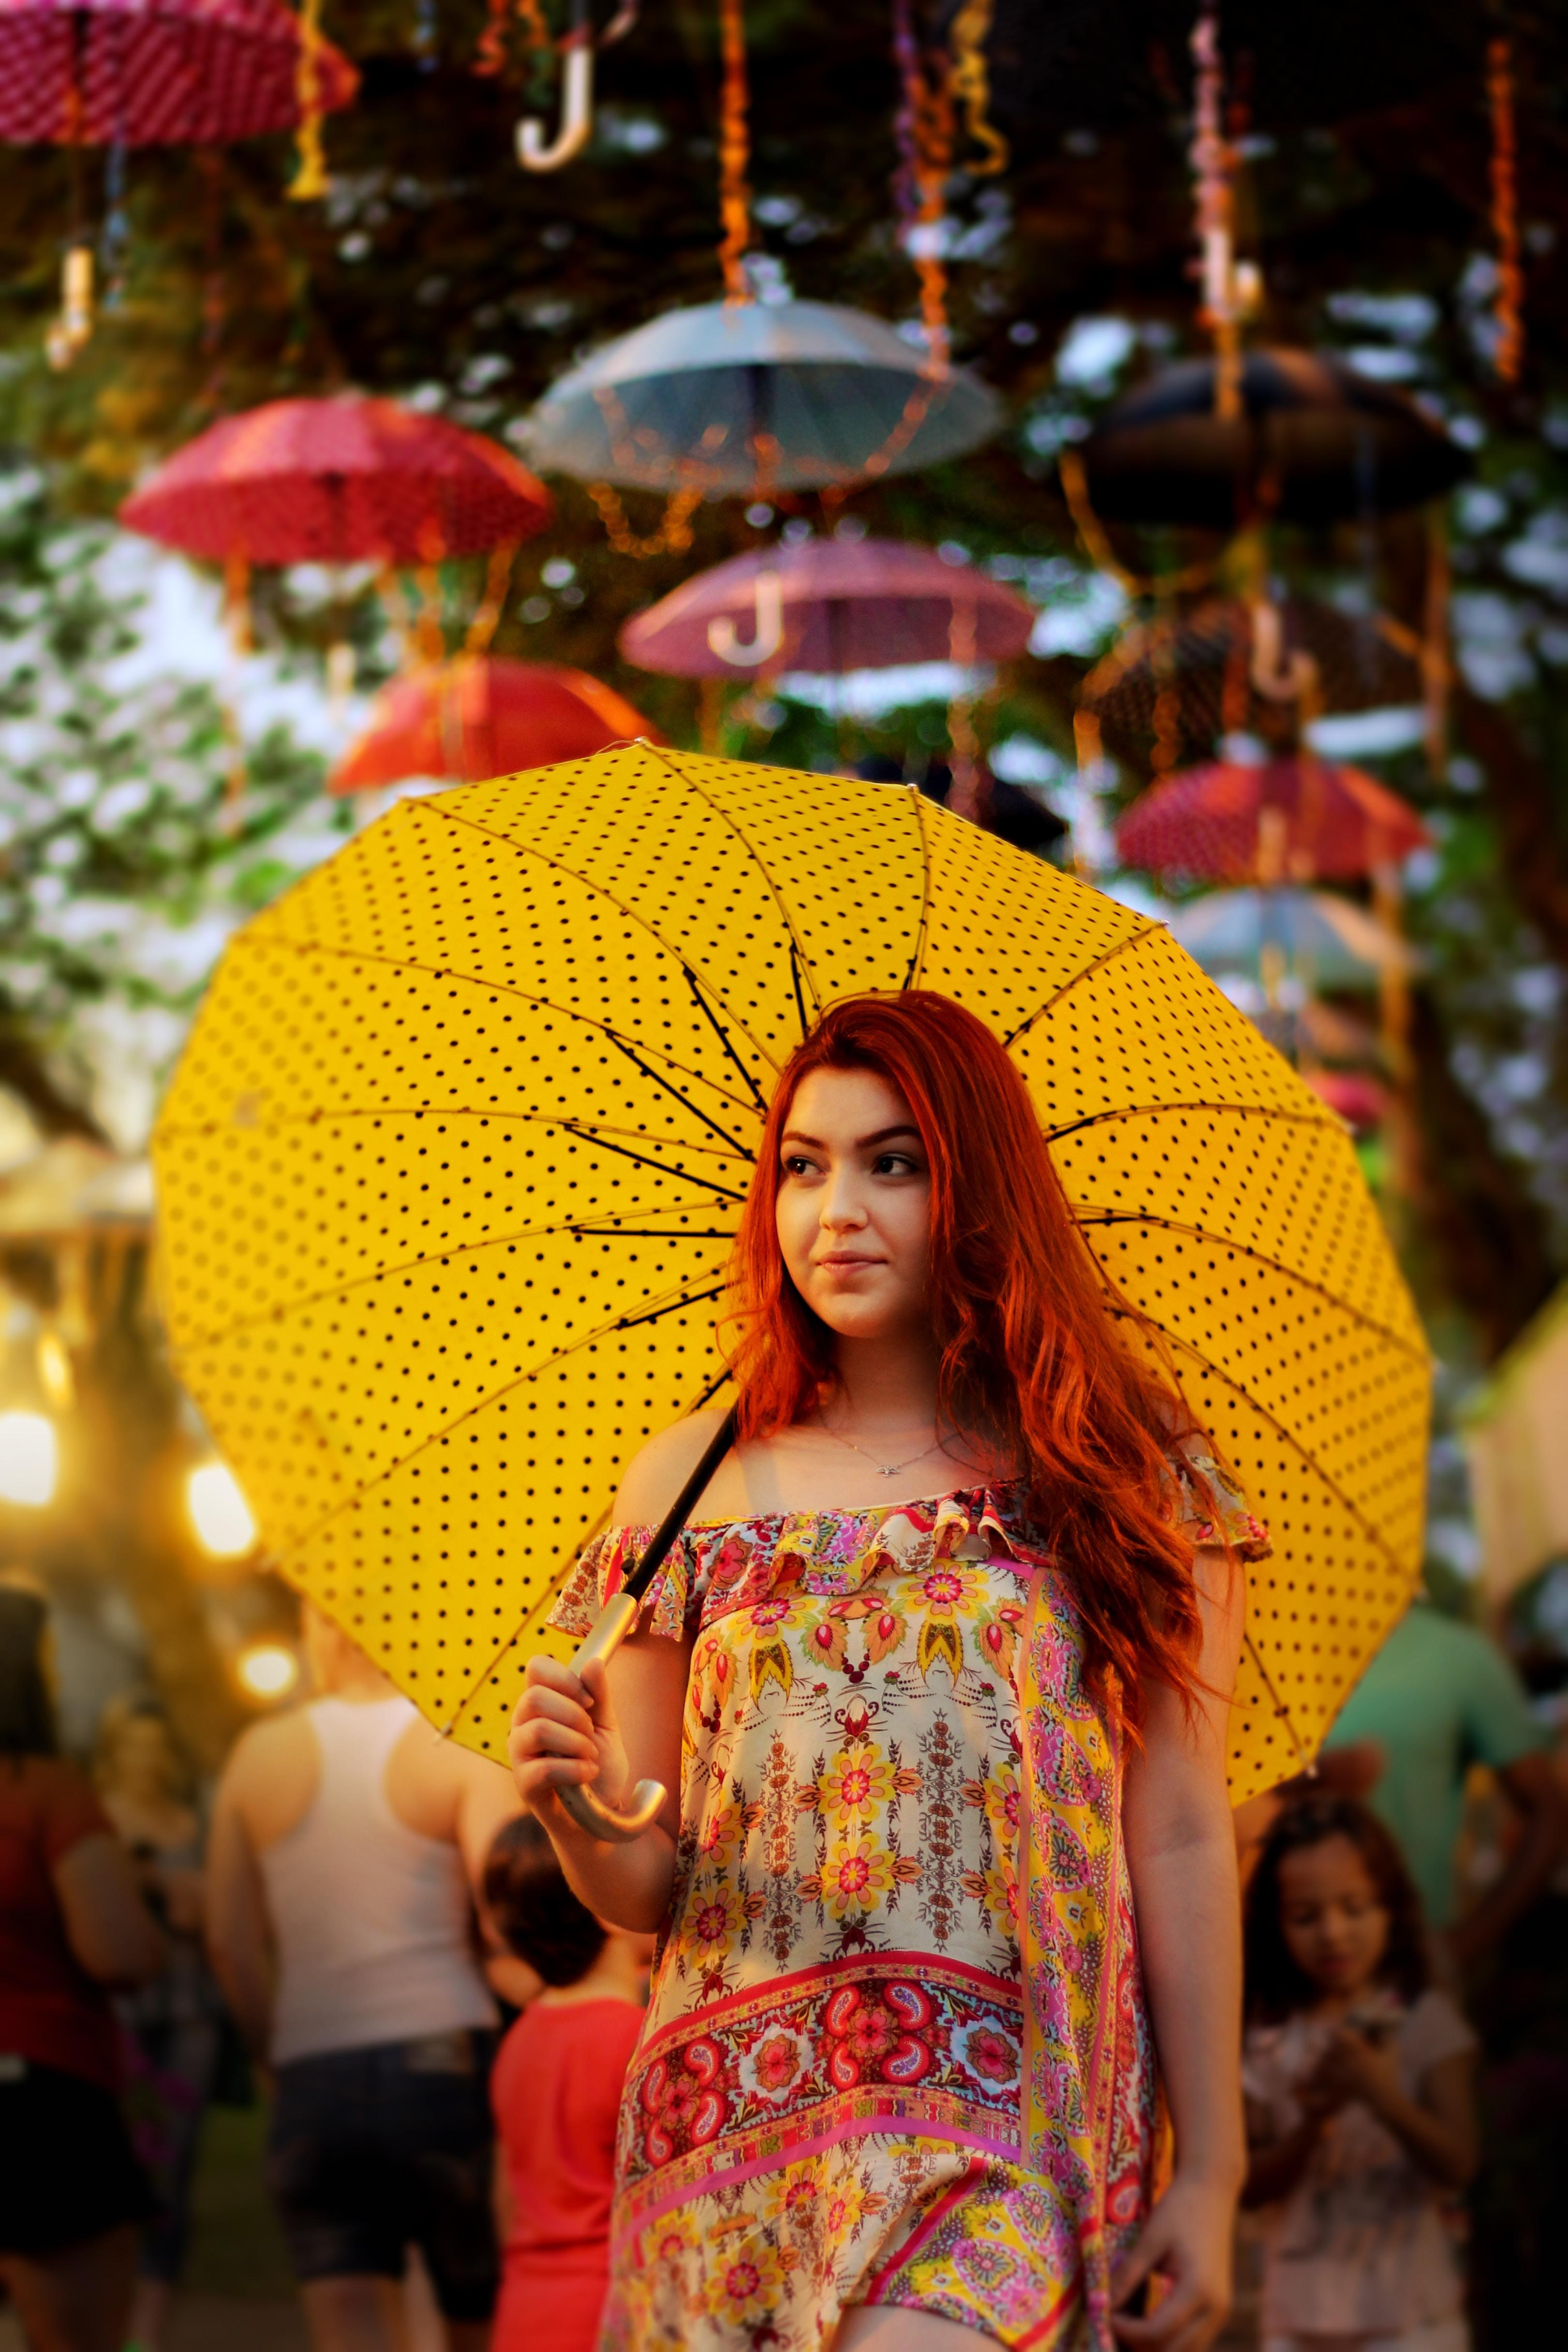 An Asian redhead female holding a yellow umbrella.